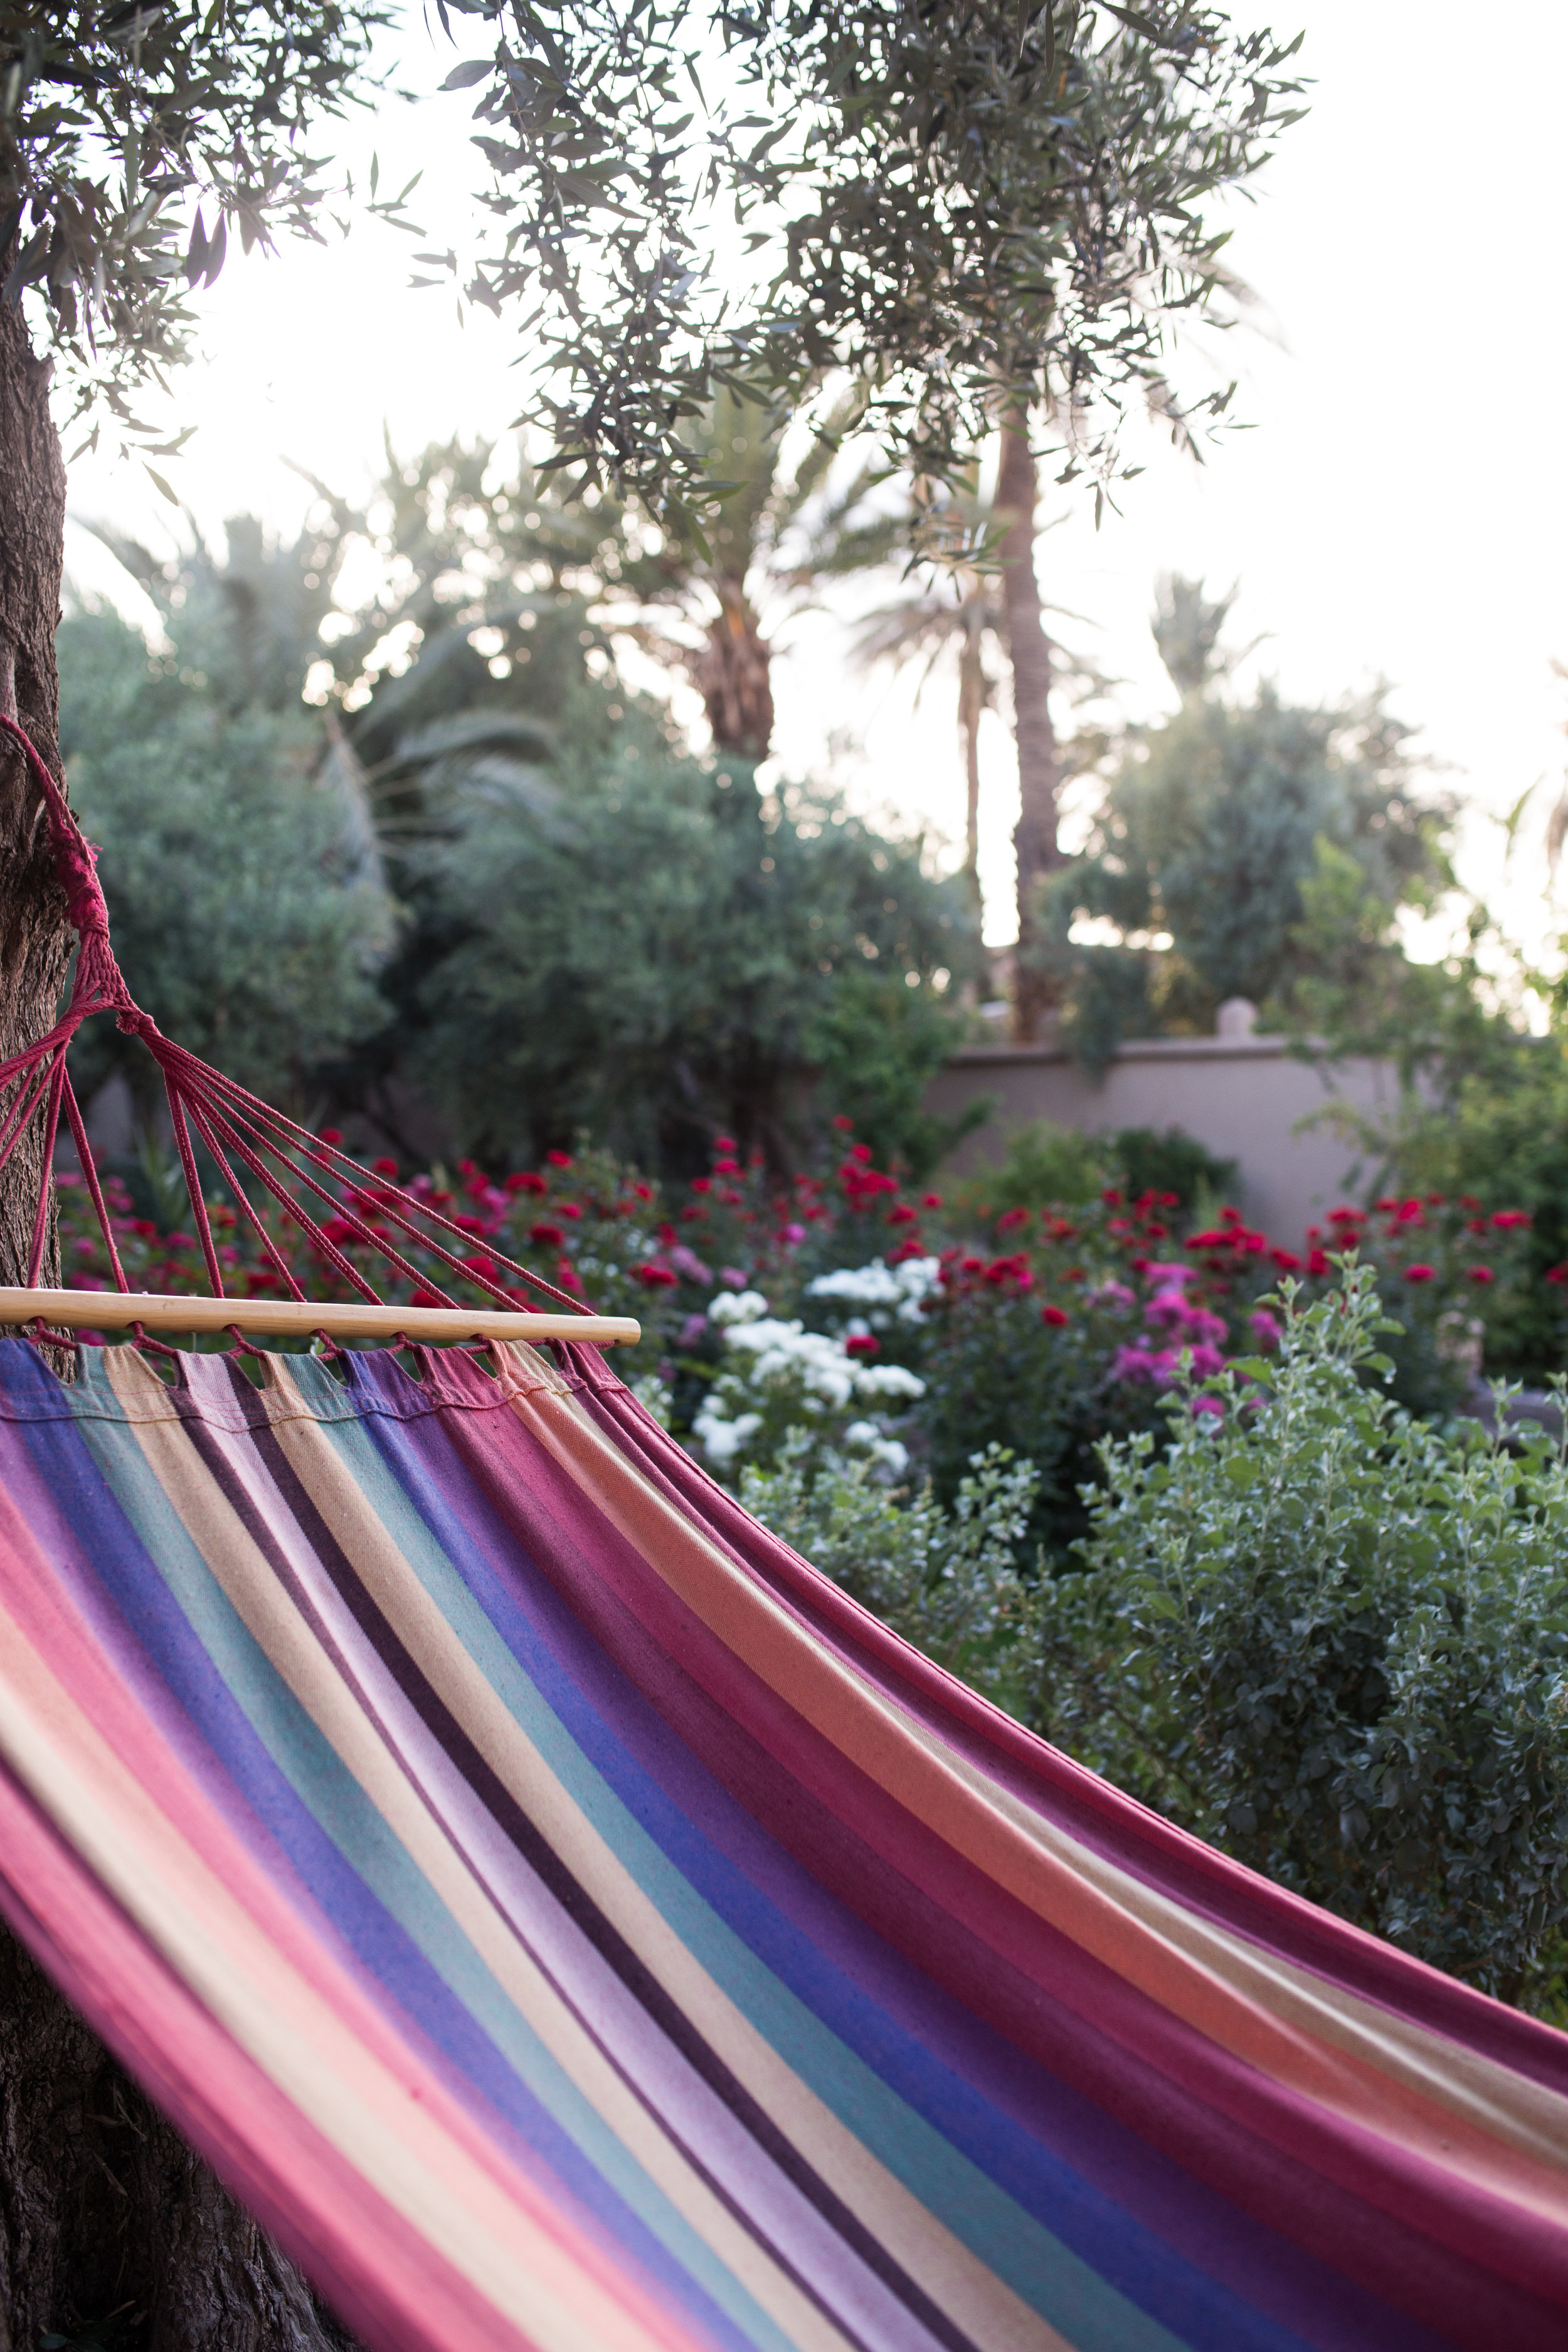 morocco-morocco travel-visit morocco-travel-travel photography-travel photographer-alina mendoza-alina mendoza photography-81.jpg